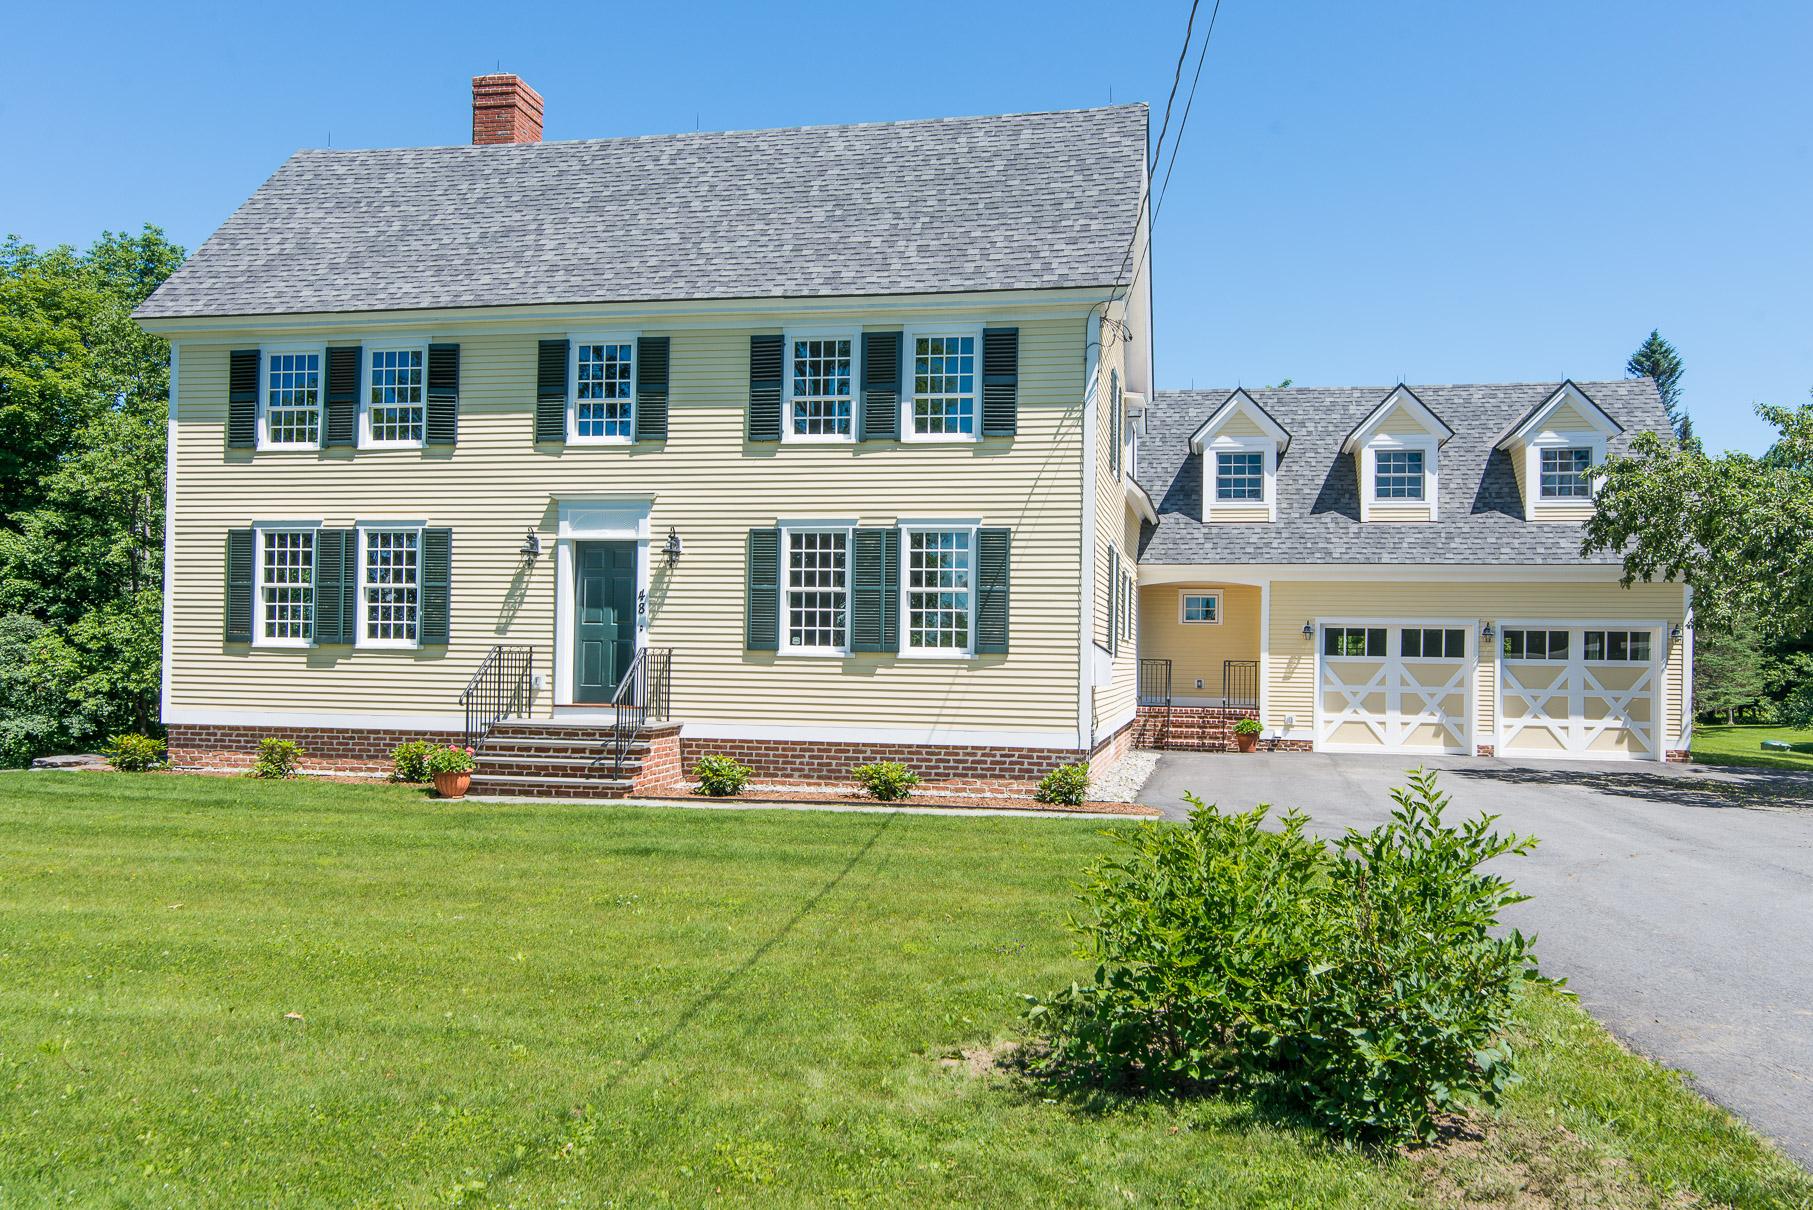 Частный односемейный дом для того Продажа на 48 King Road, Hanover 48 King Rd Hanover, Нью-Гэмпшир 03755 Соединенные Штаты